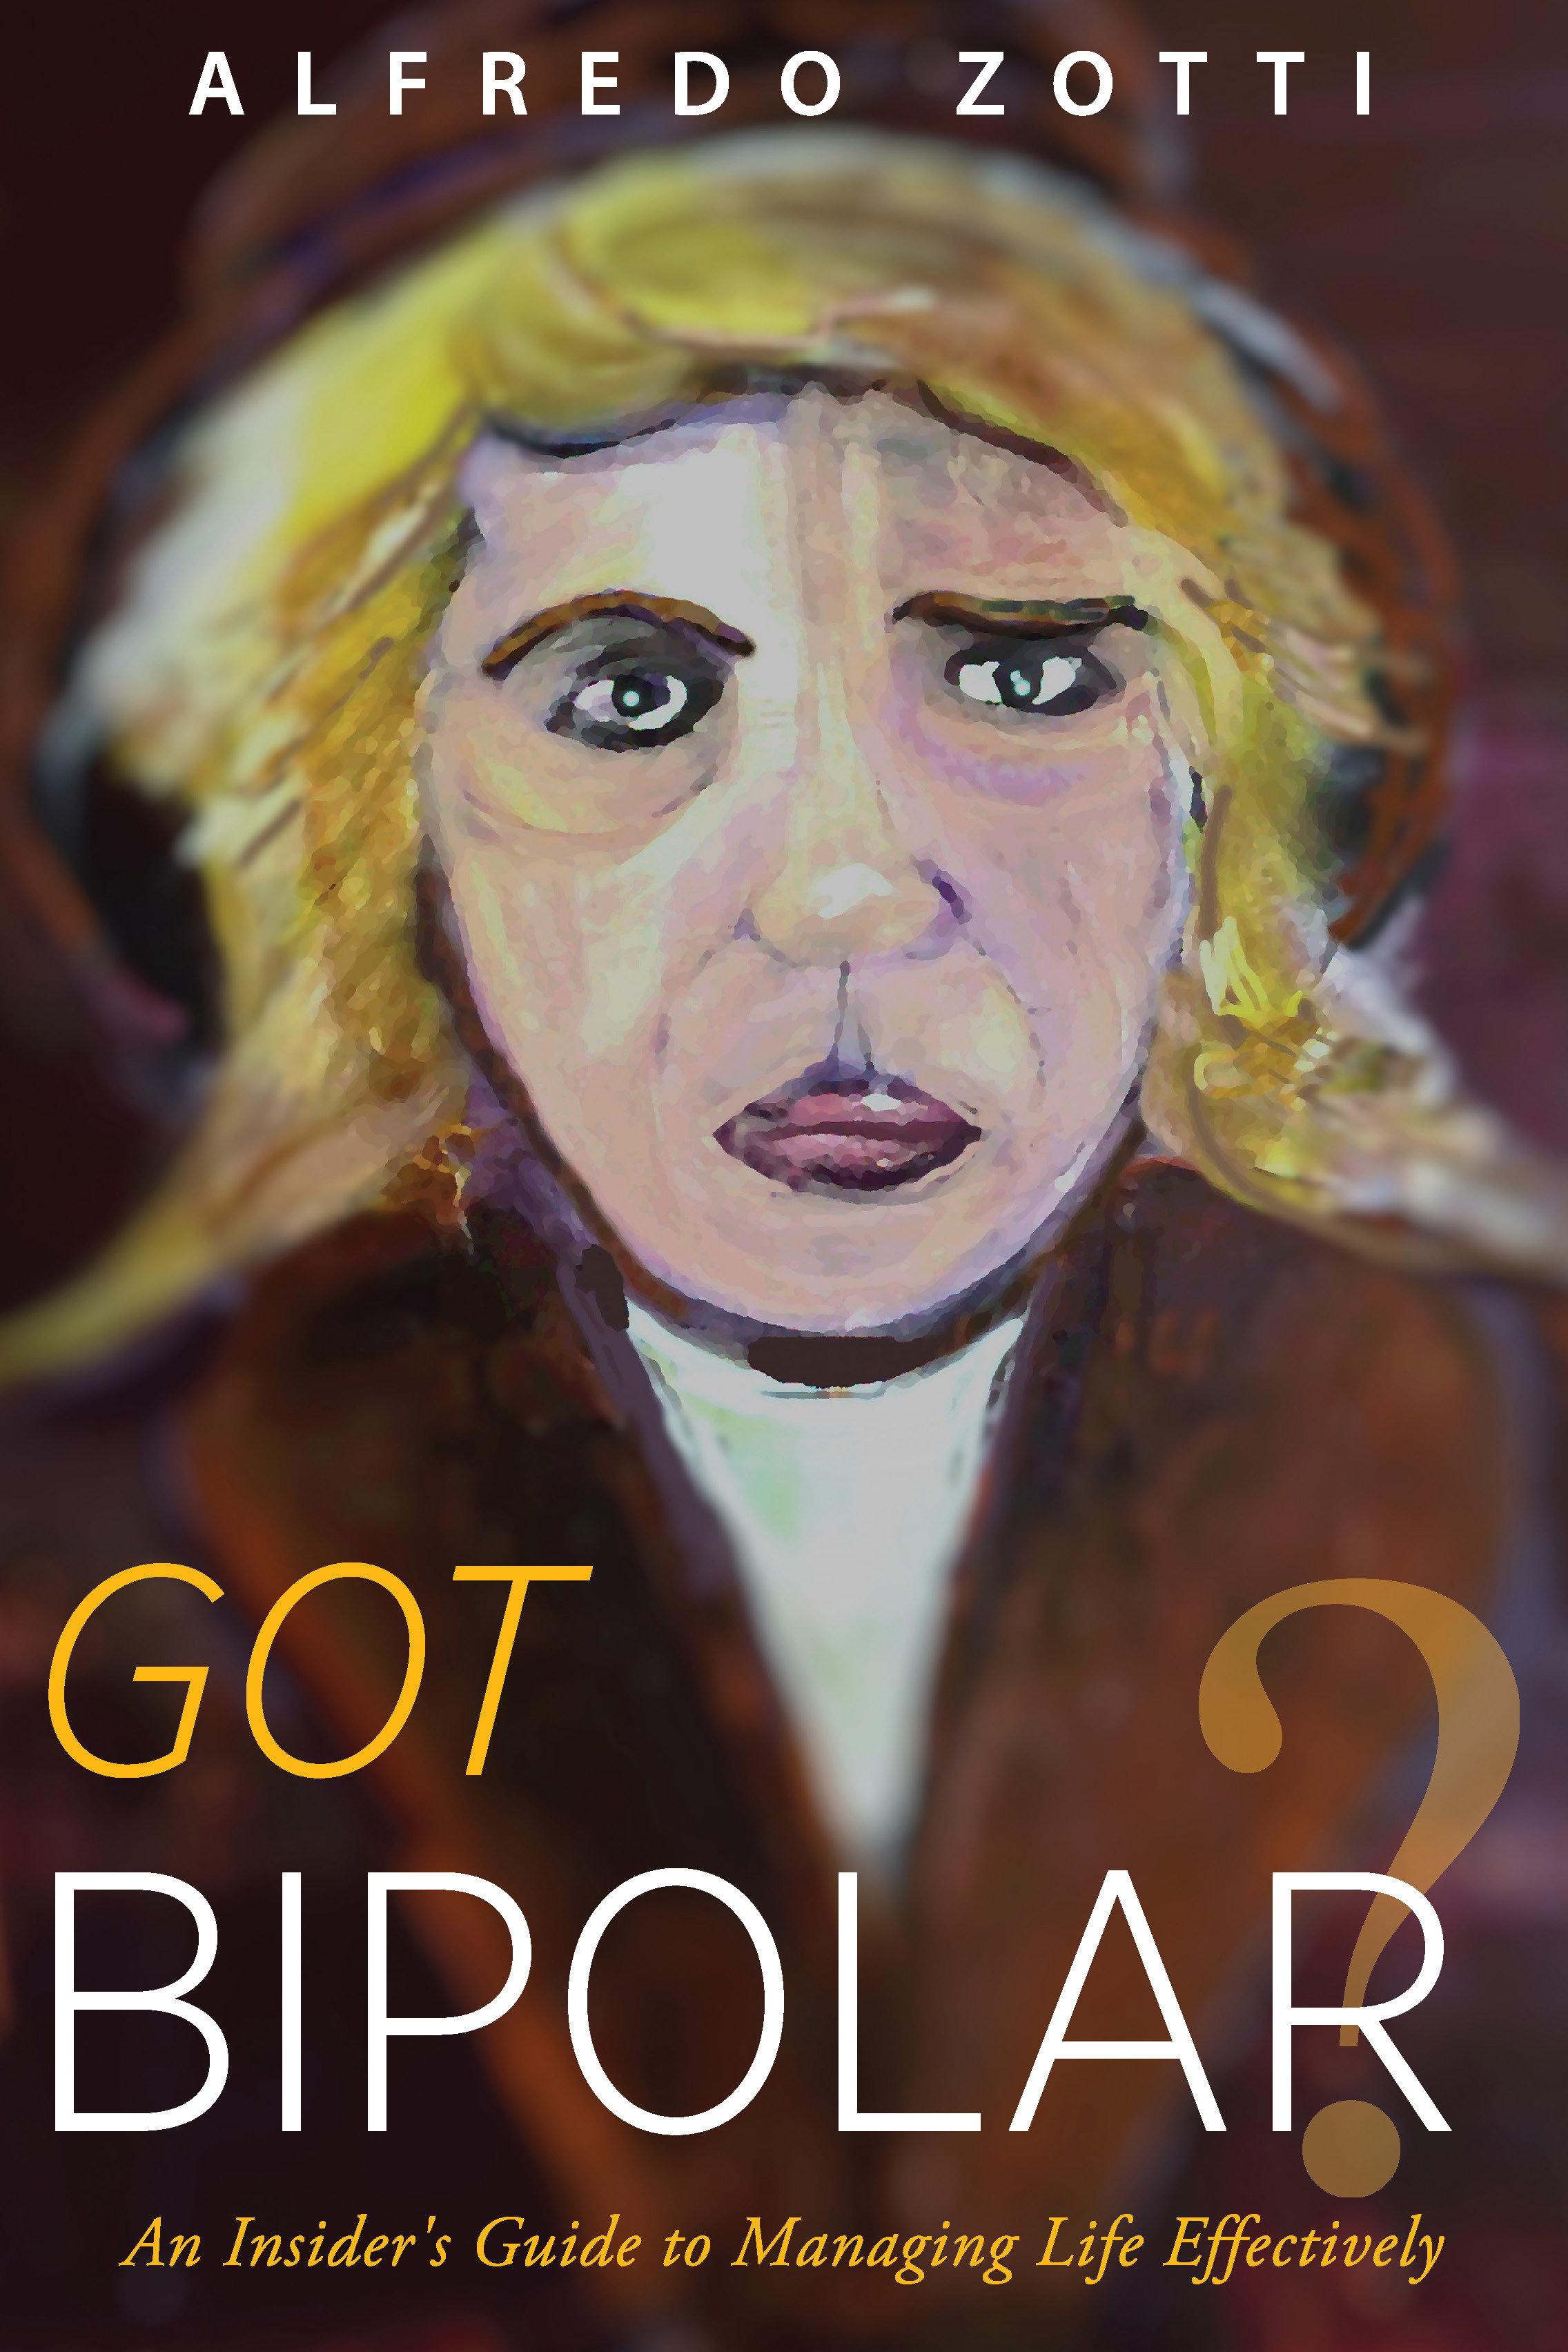 Got Bipolar? 978-1-61599-362-8